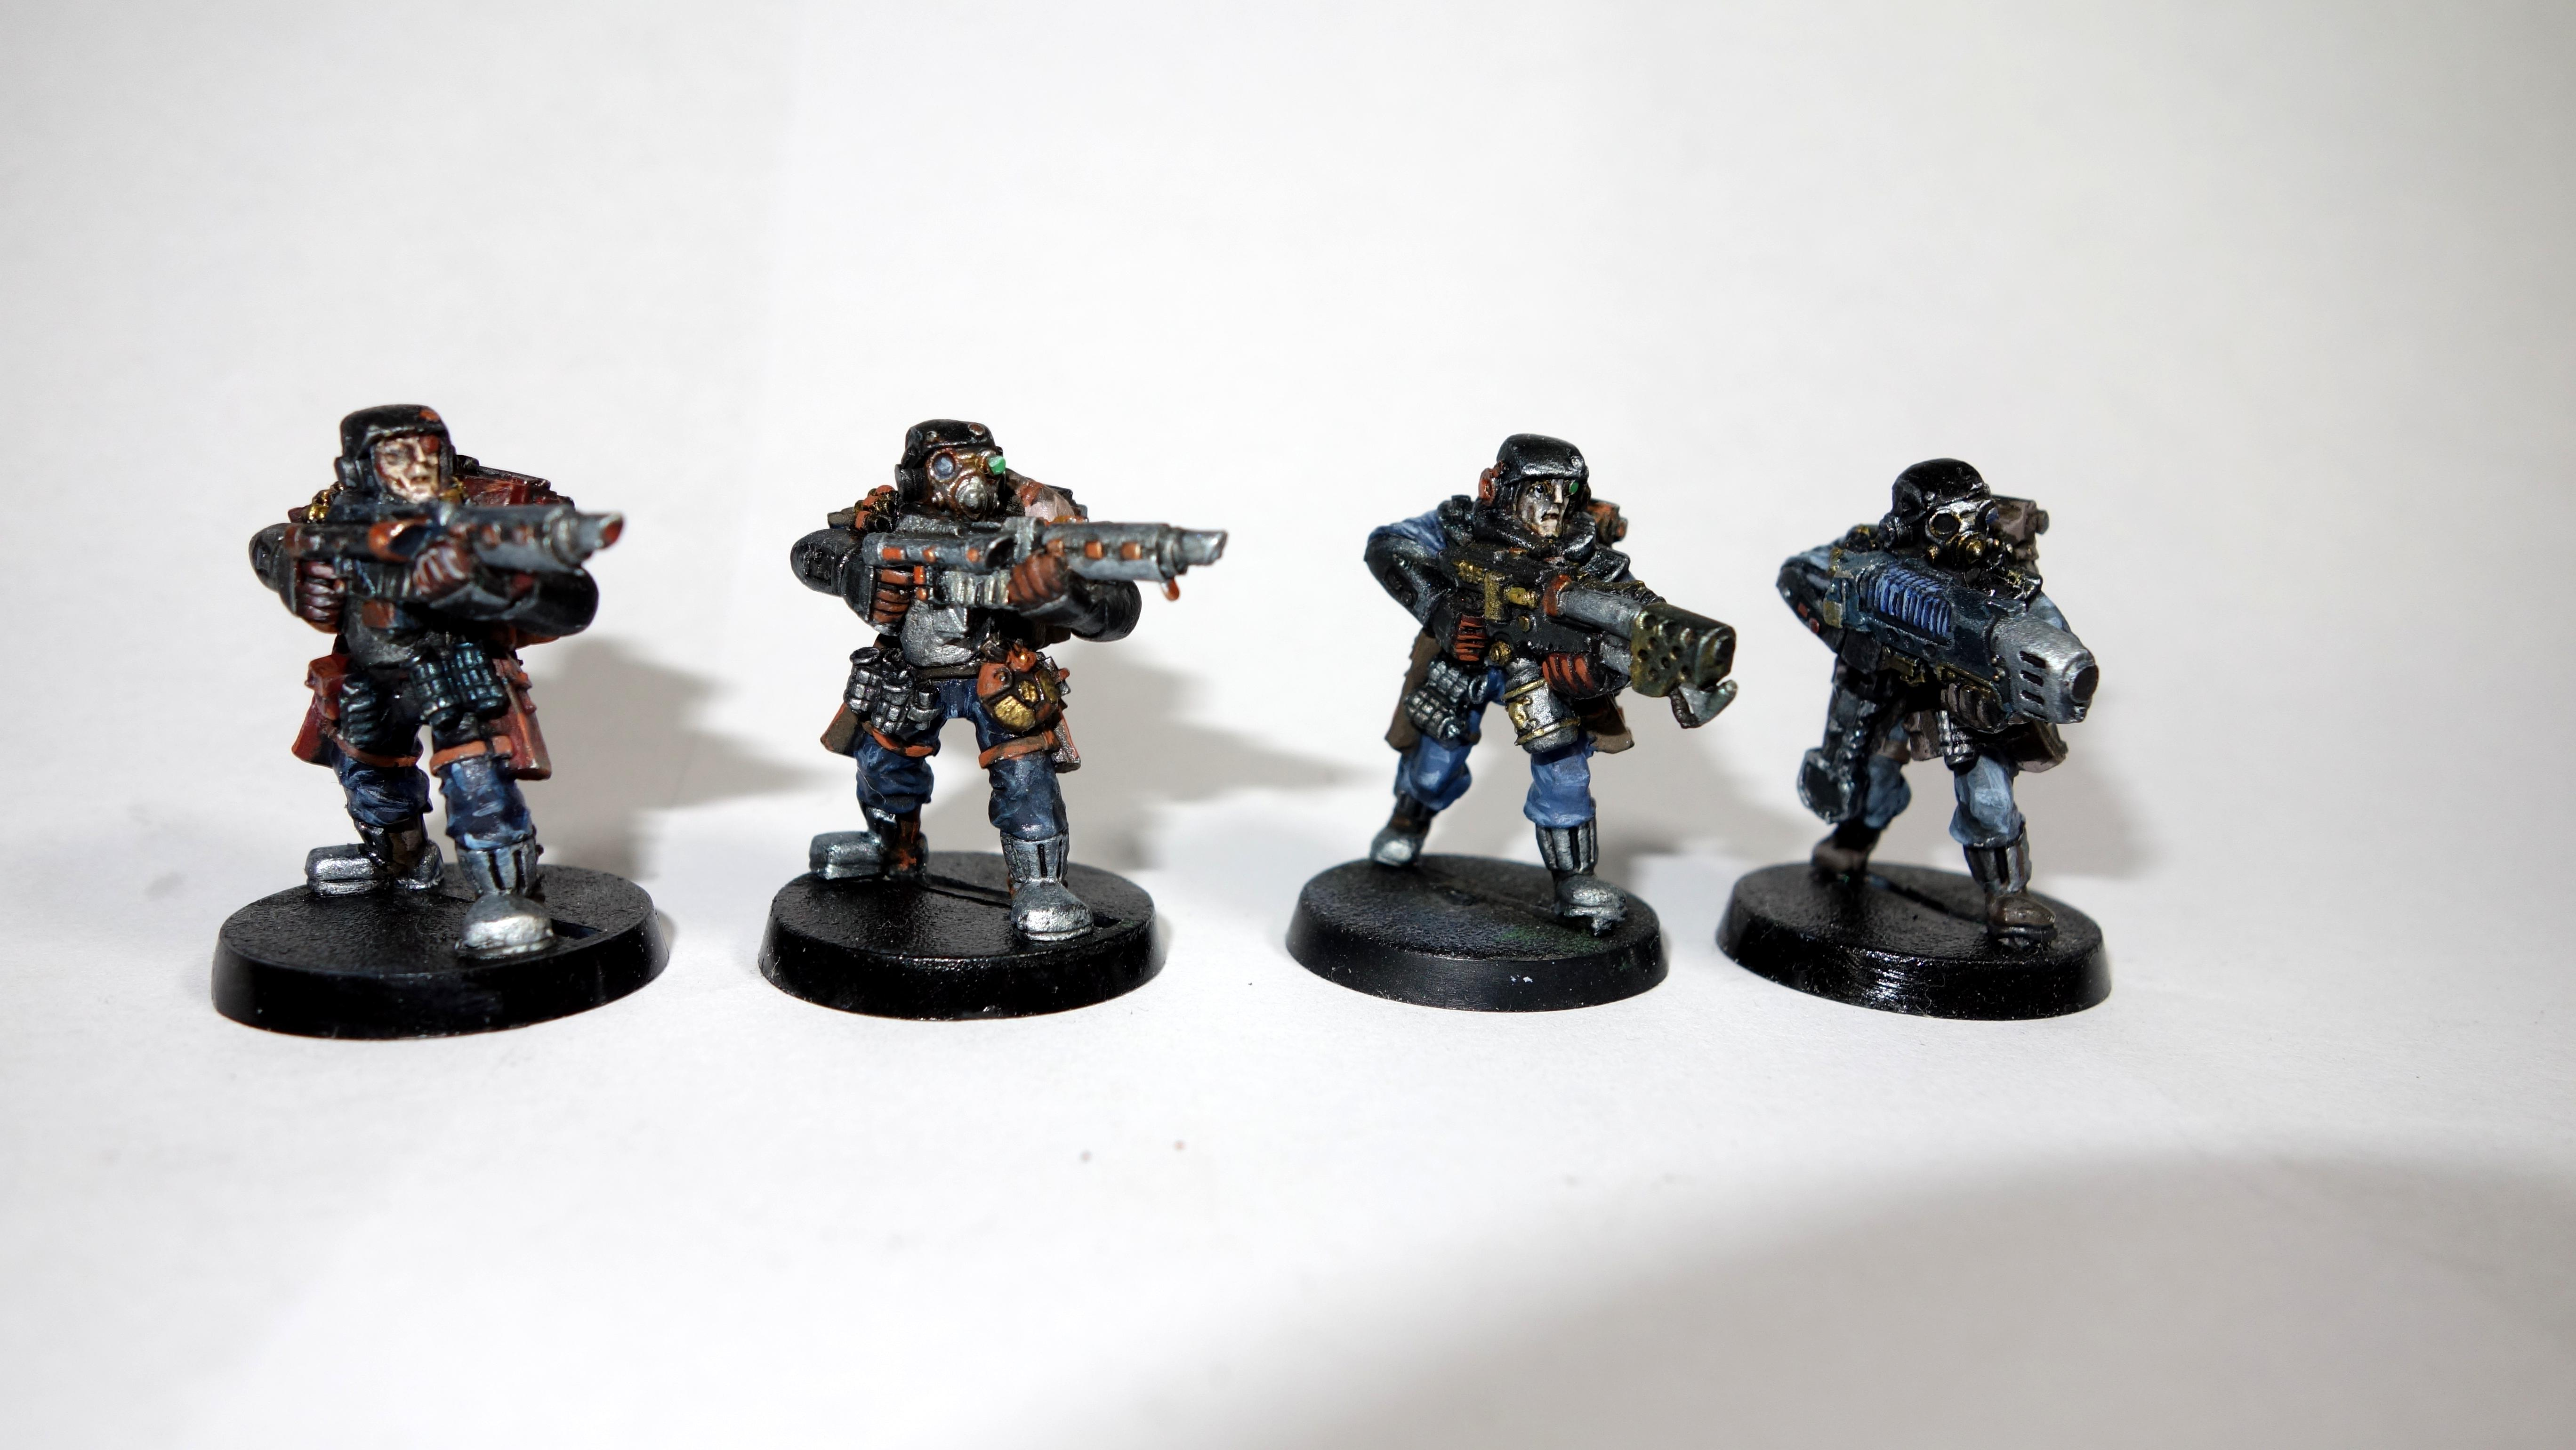 Militarum Tempestus, Storm Troopers, Warhammer 40,000